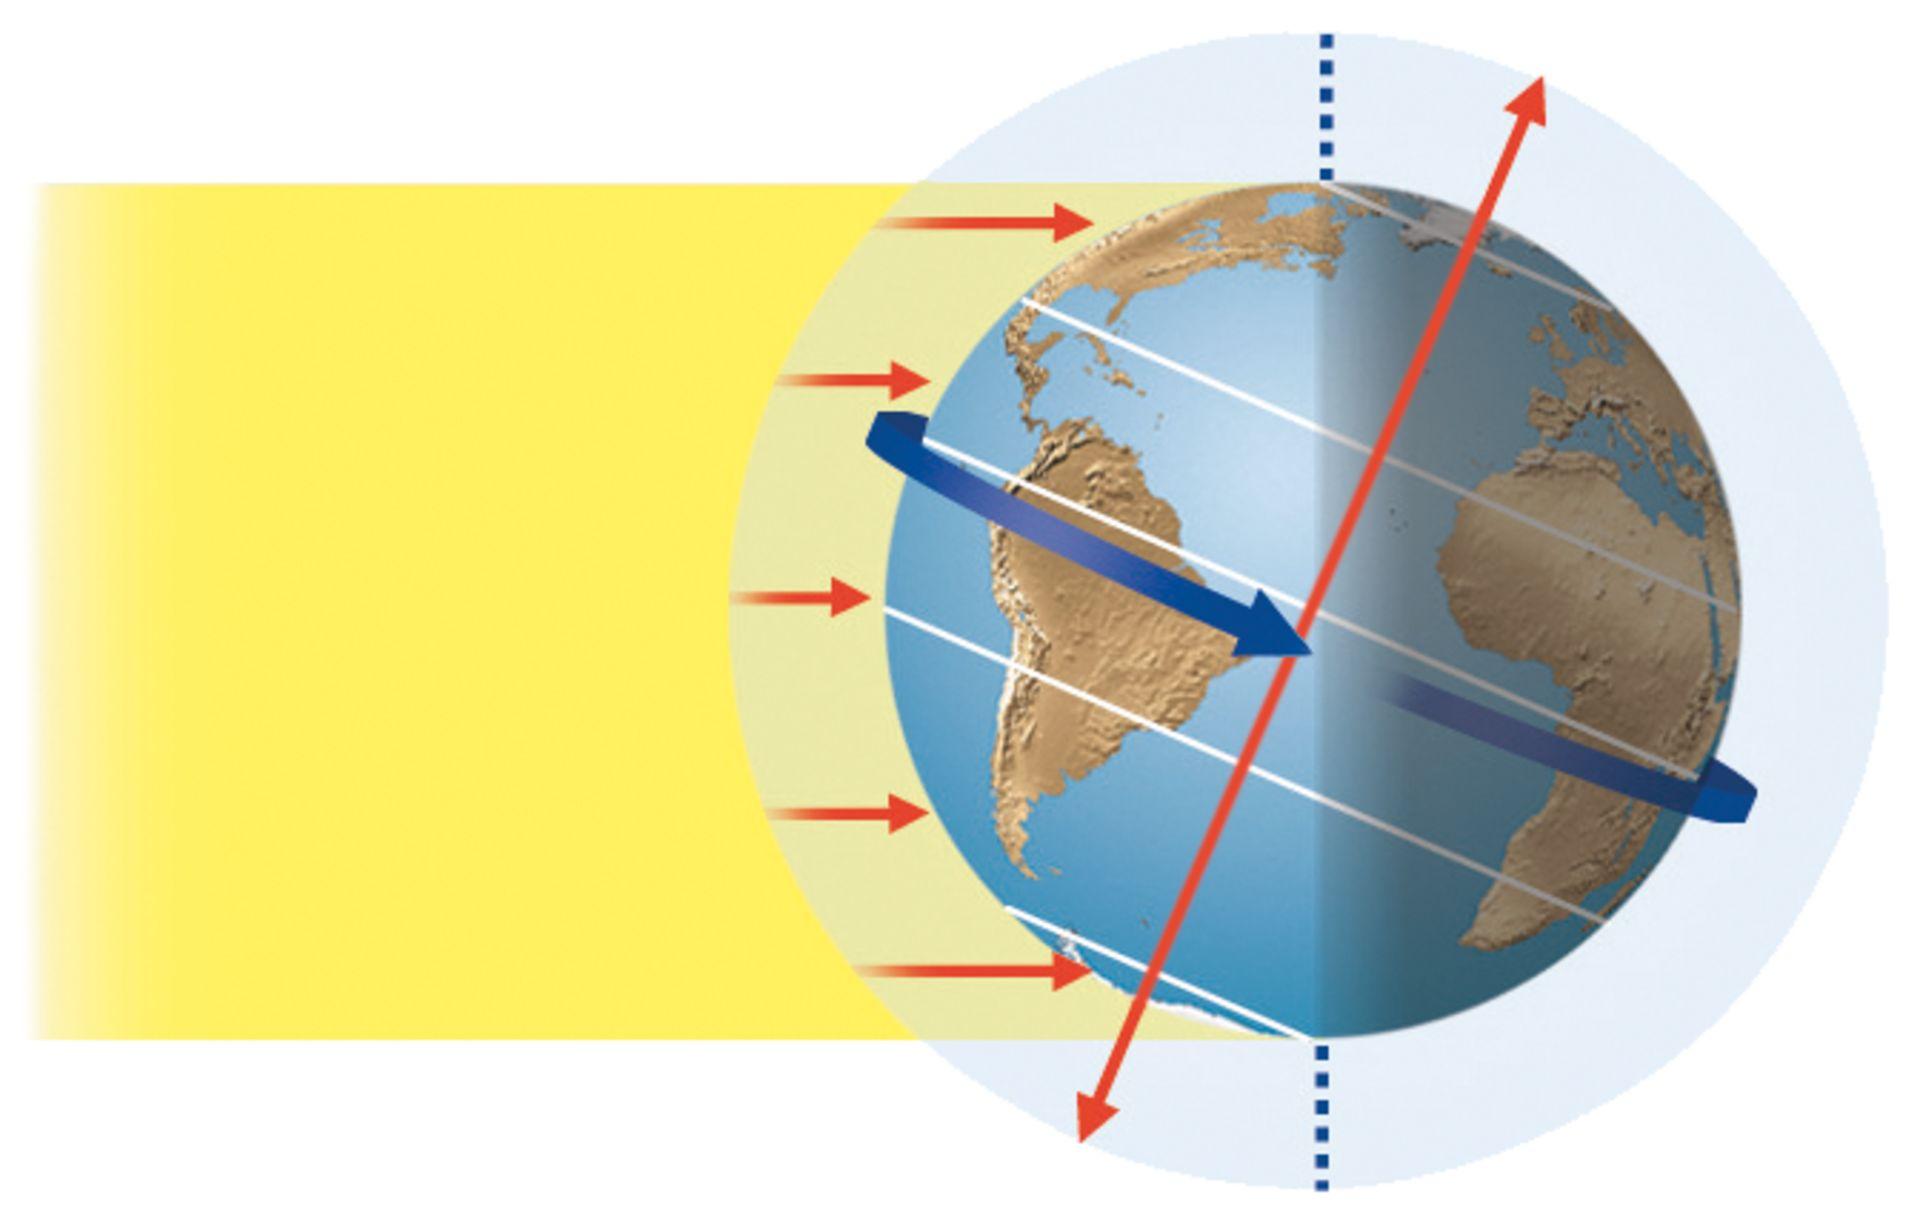 DK_solar_heating_flt-c_zycf0x